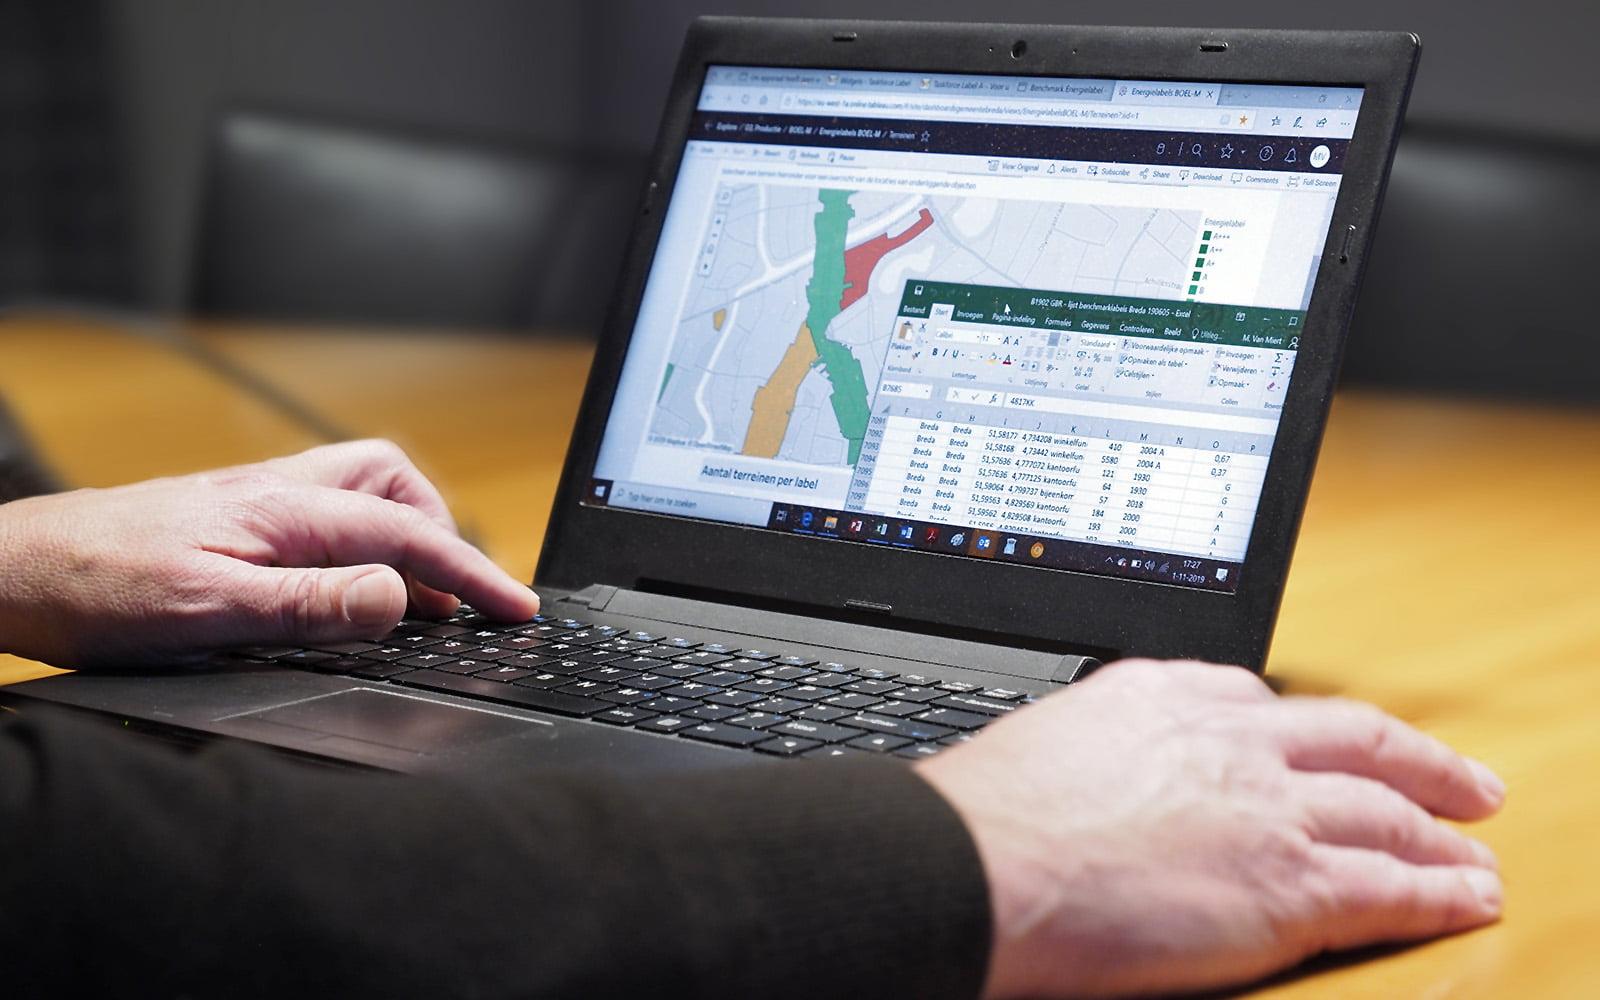 Tableau software op laptop